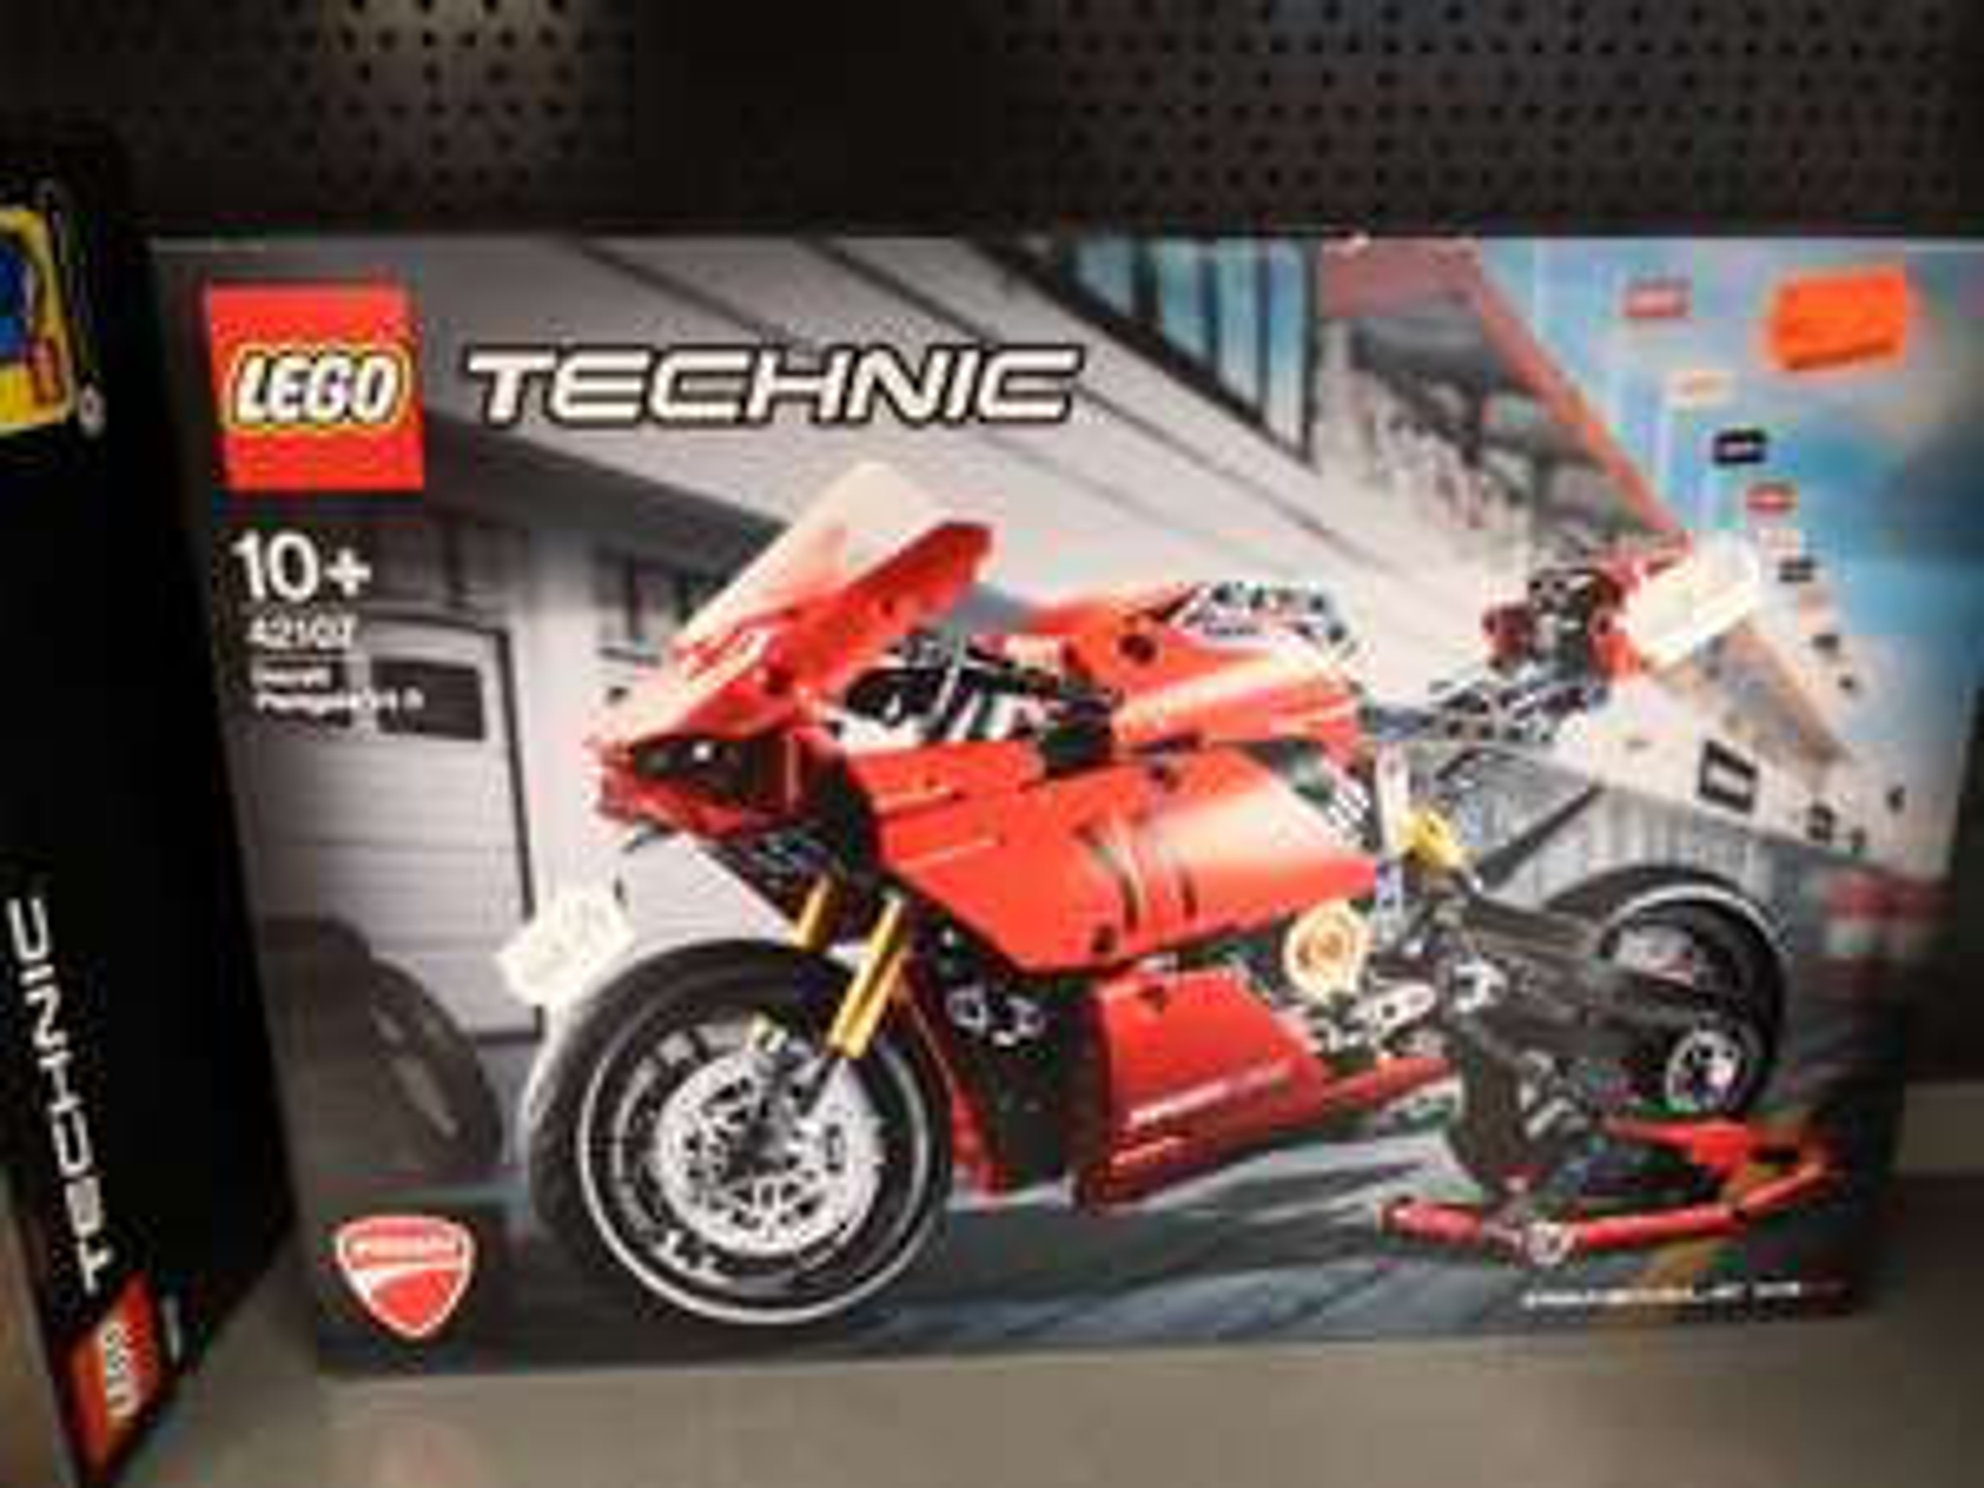 Lokal - Lego Technic Ducati 42107 - Kaufland Kulmbach